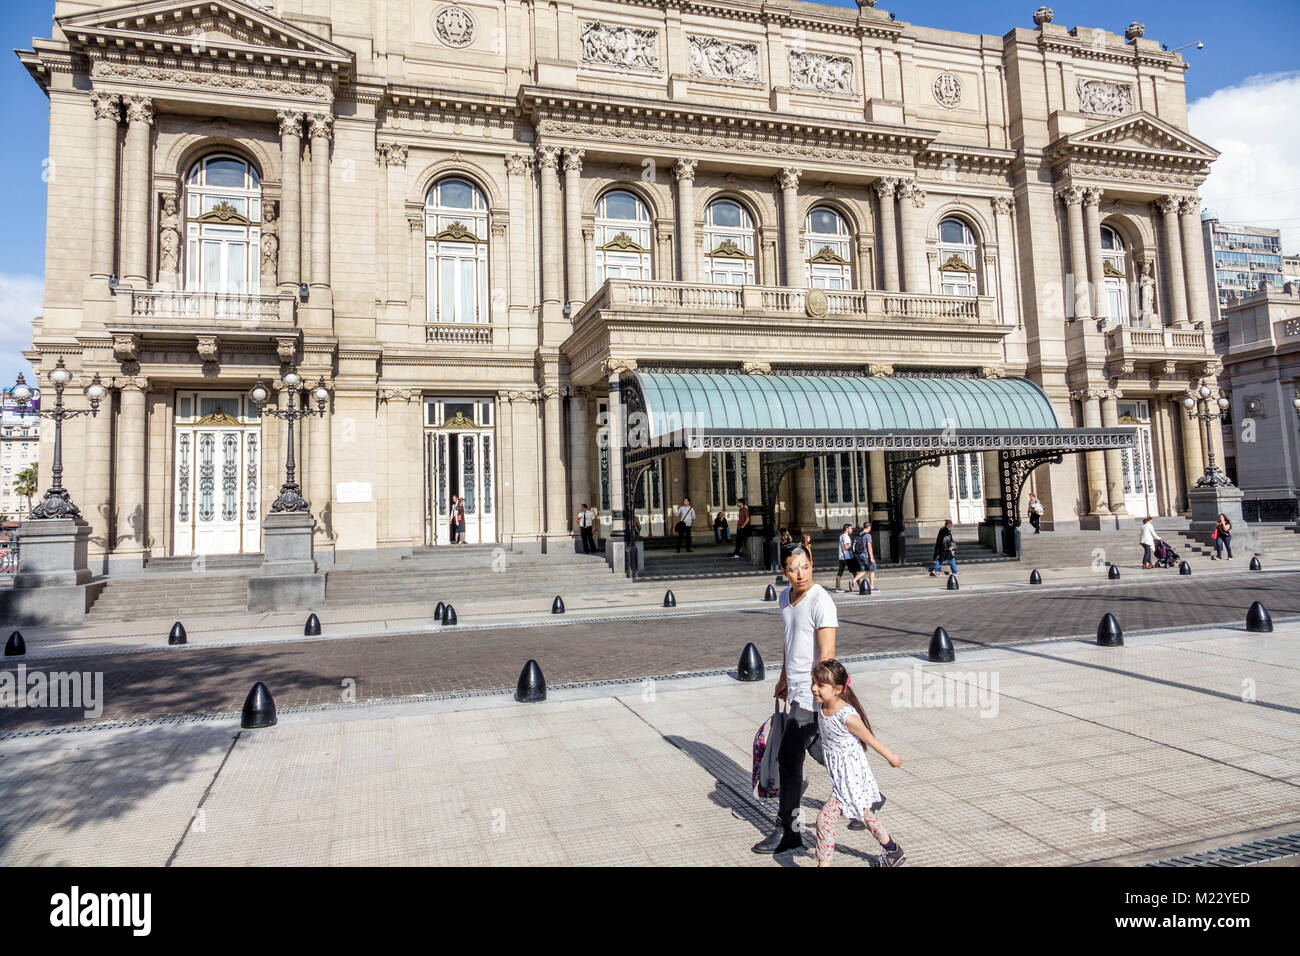 Buenos Aires Argentina Libertad Street Teatro Colon opera house theater theatre exterior facade Eclectic architecture - Stock Image